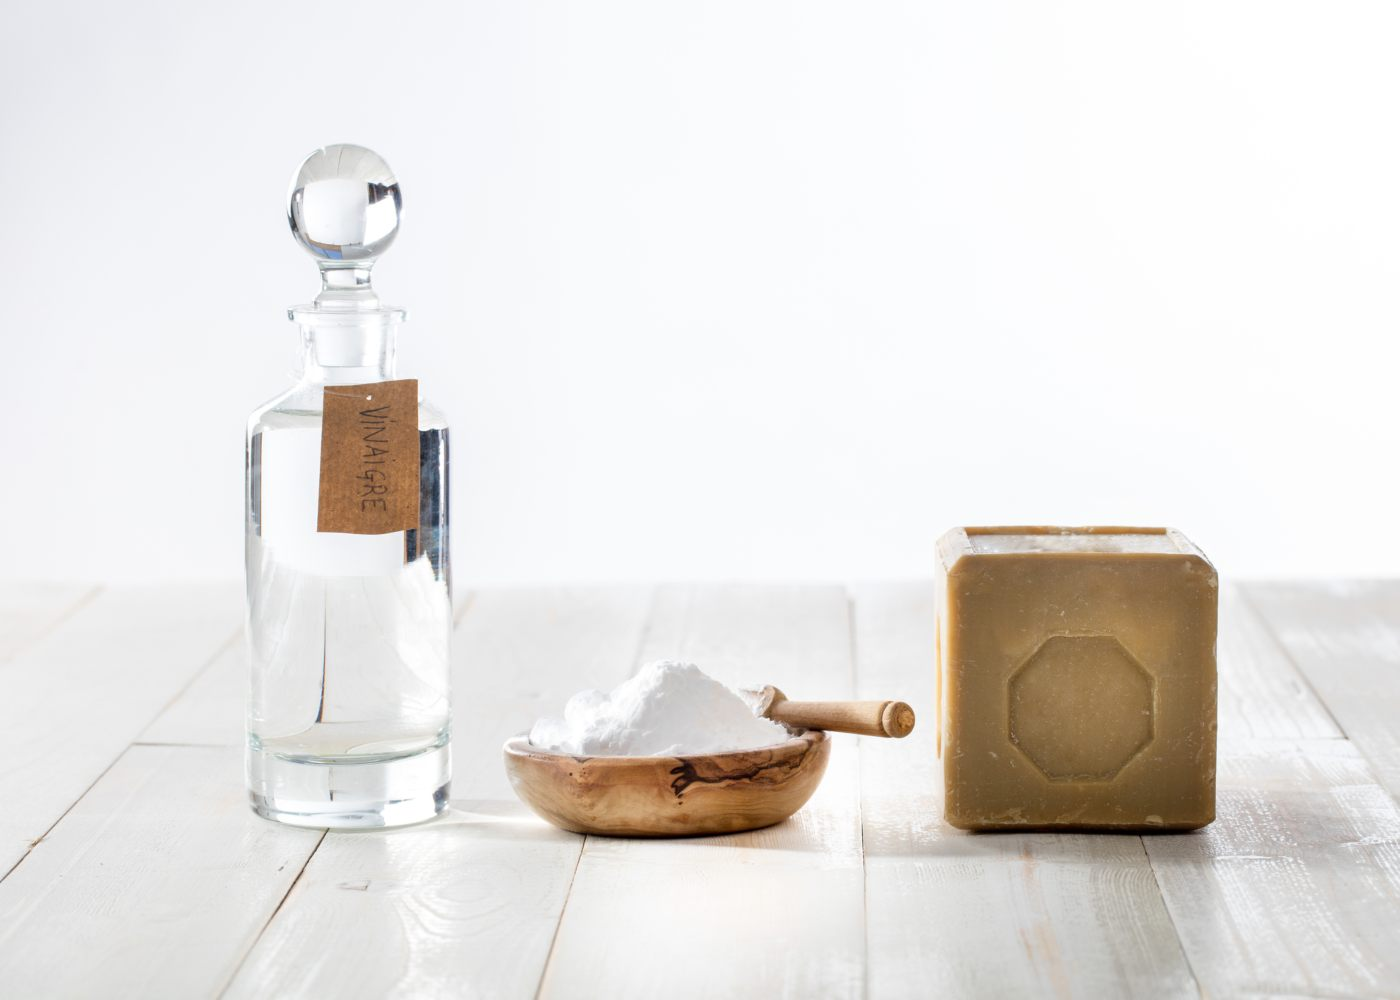 vinagre para limpeza, bicarbonato de sódio e sabão